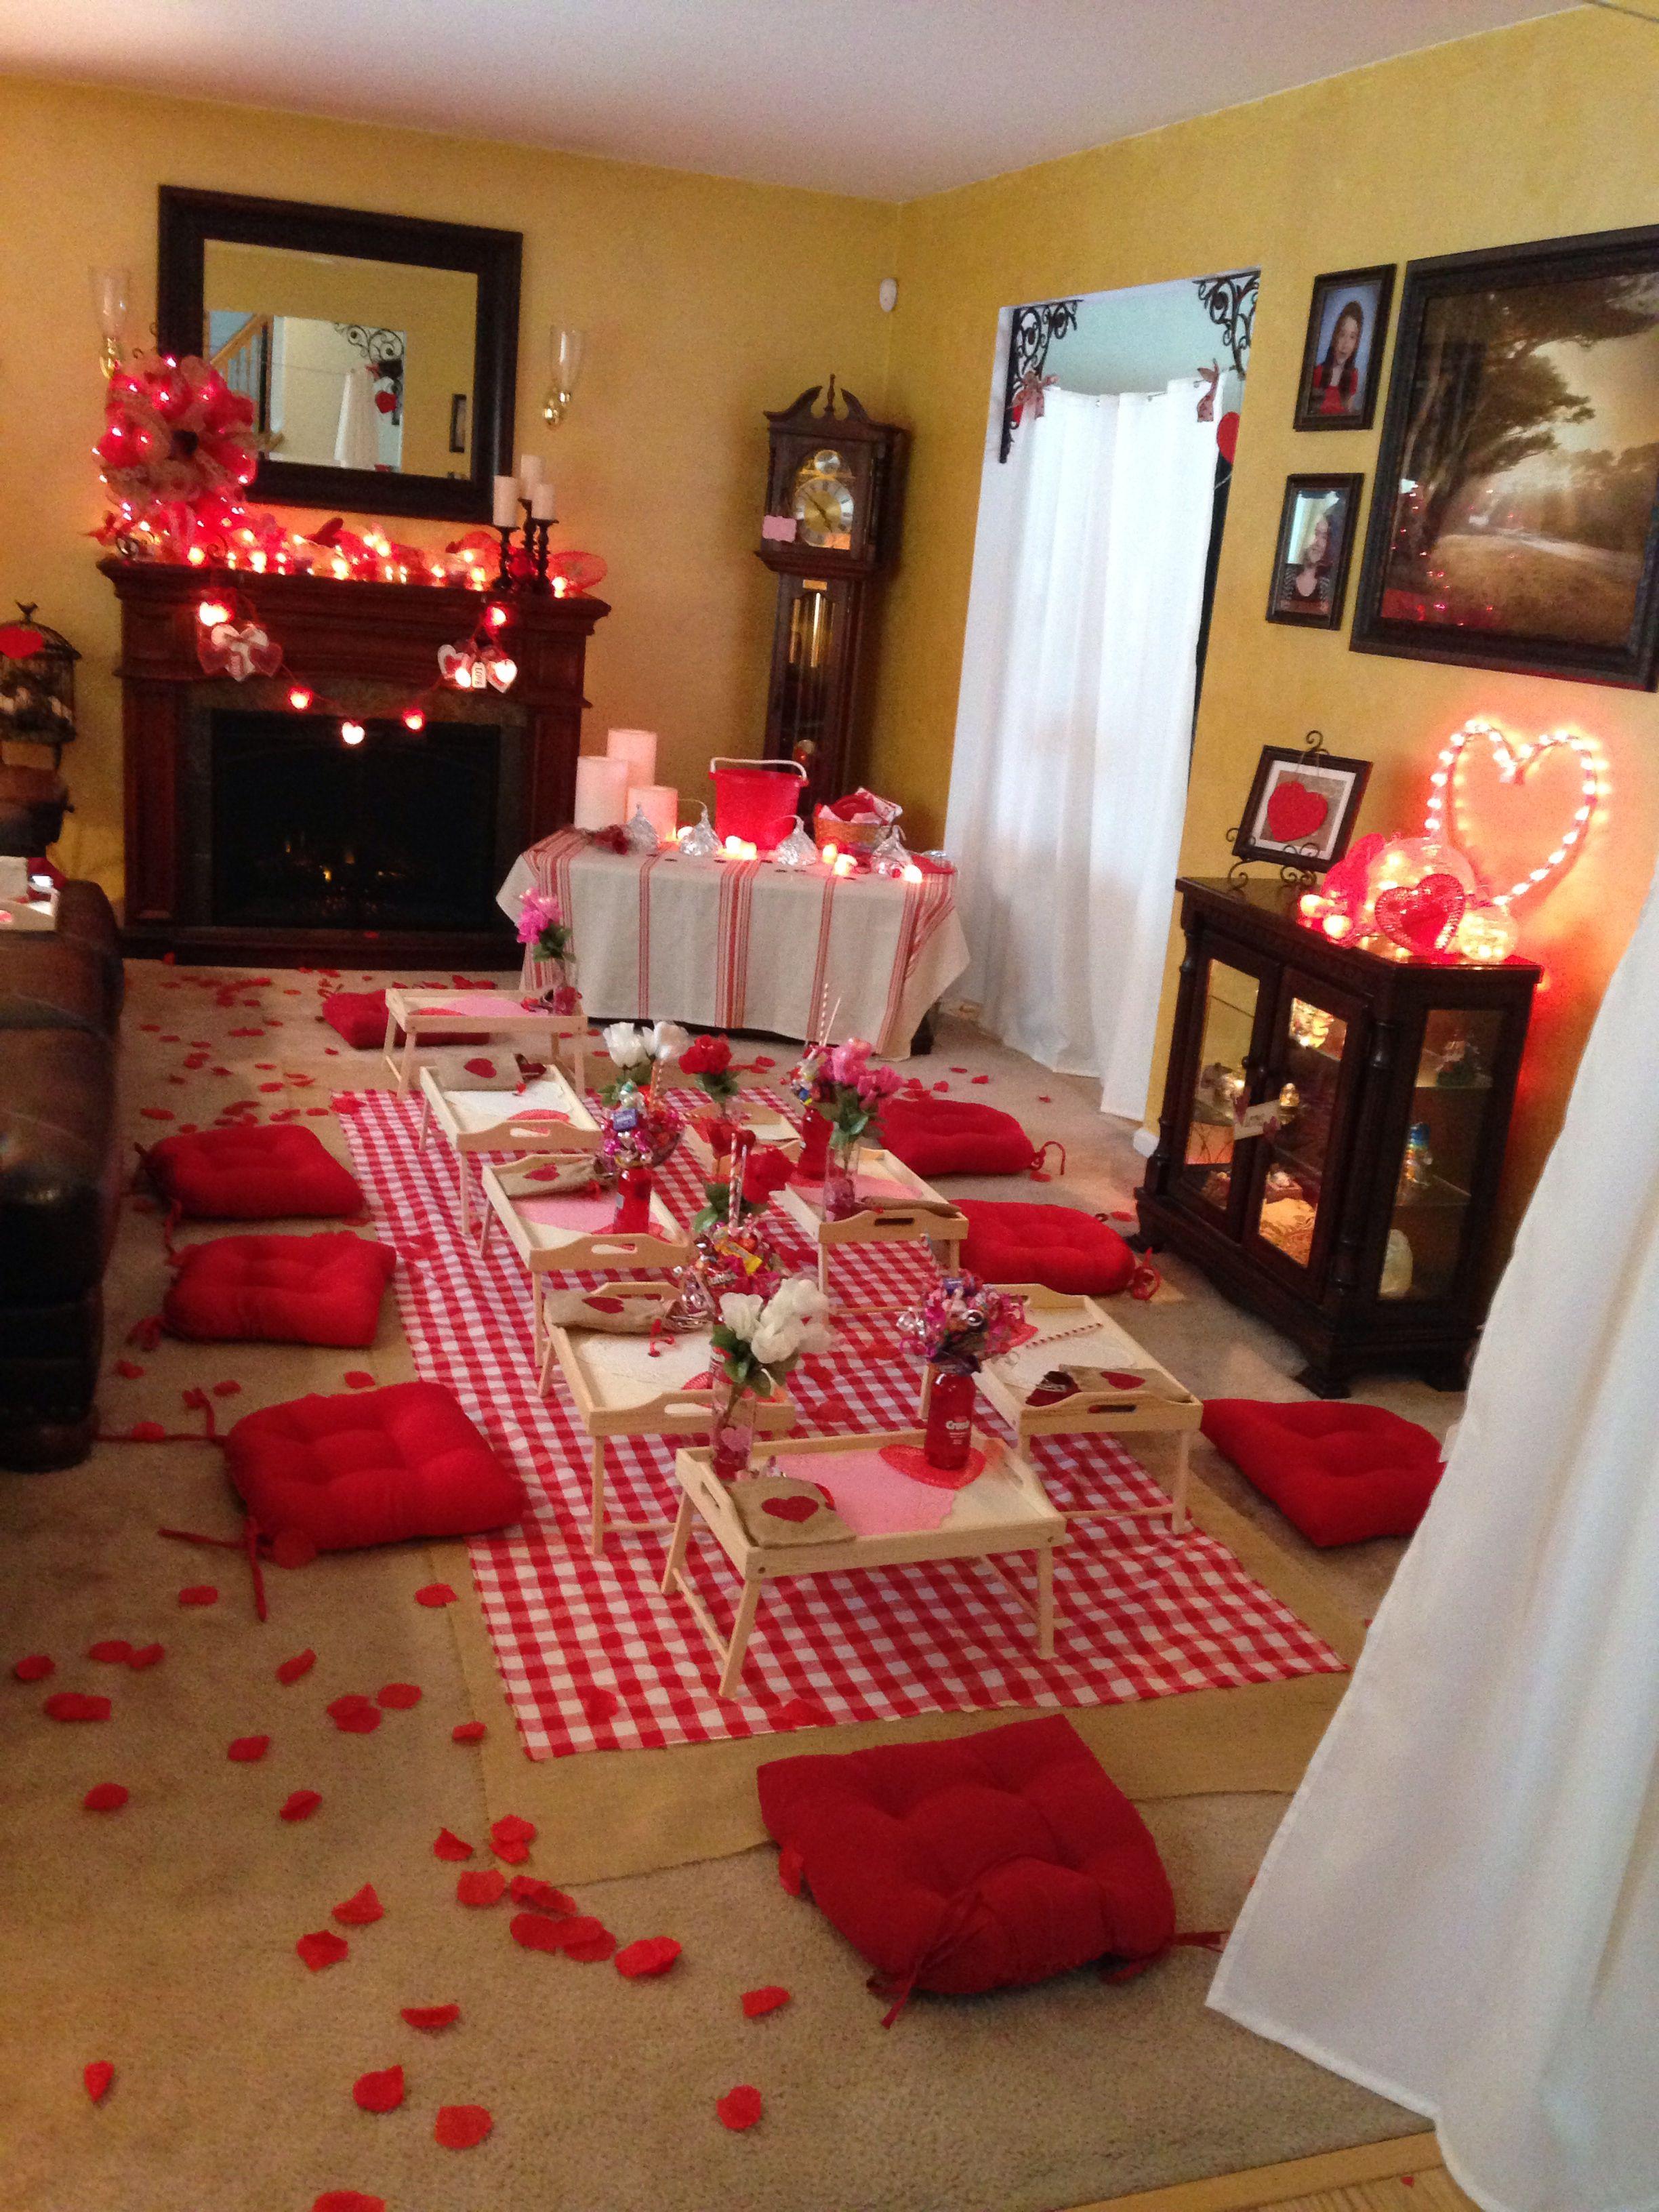 Indoor Picnic Valentines Day Valentines Day Date Valentines Day Decorations Indoor Picnic